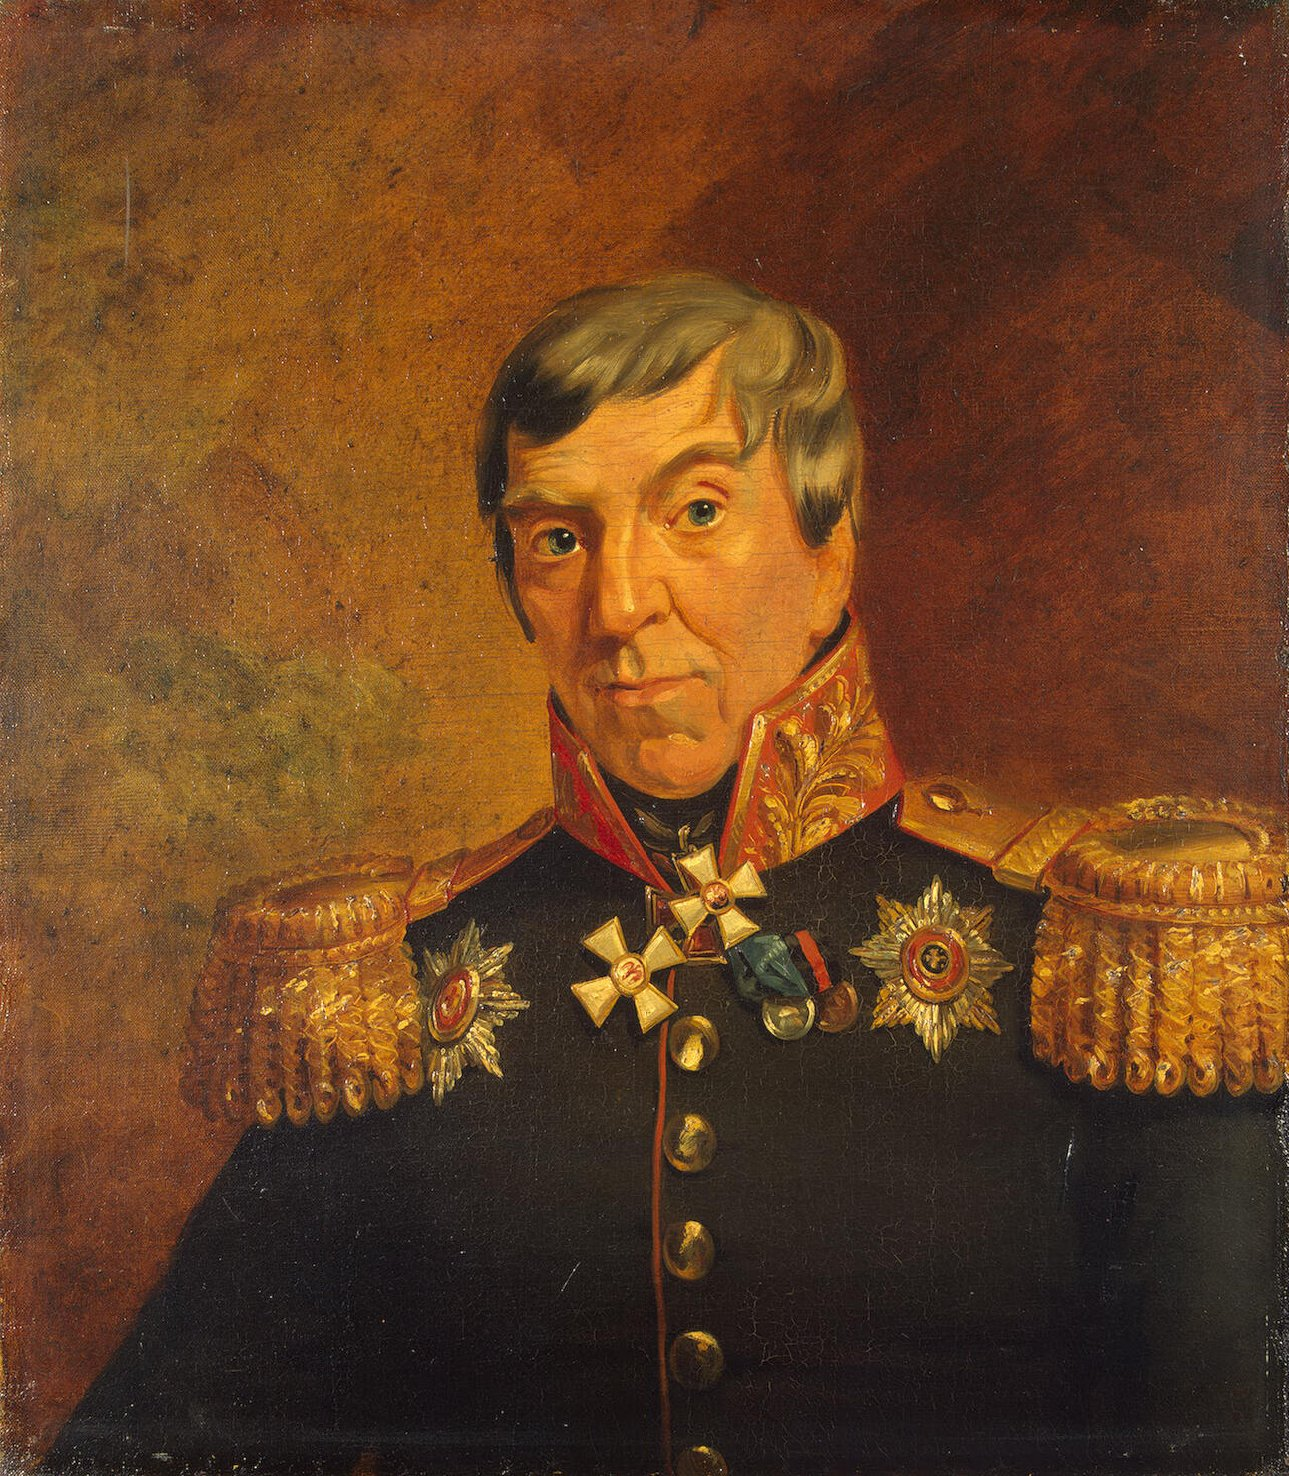 Энгельгардт, Григорий Григорьевич